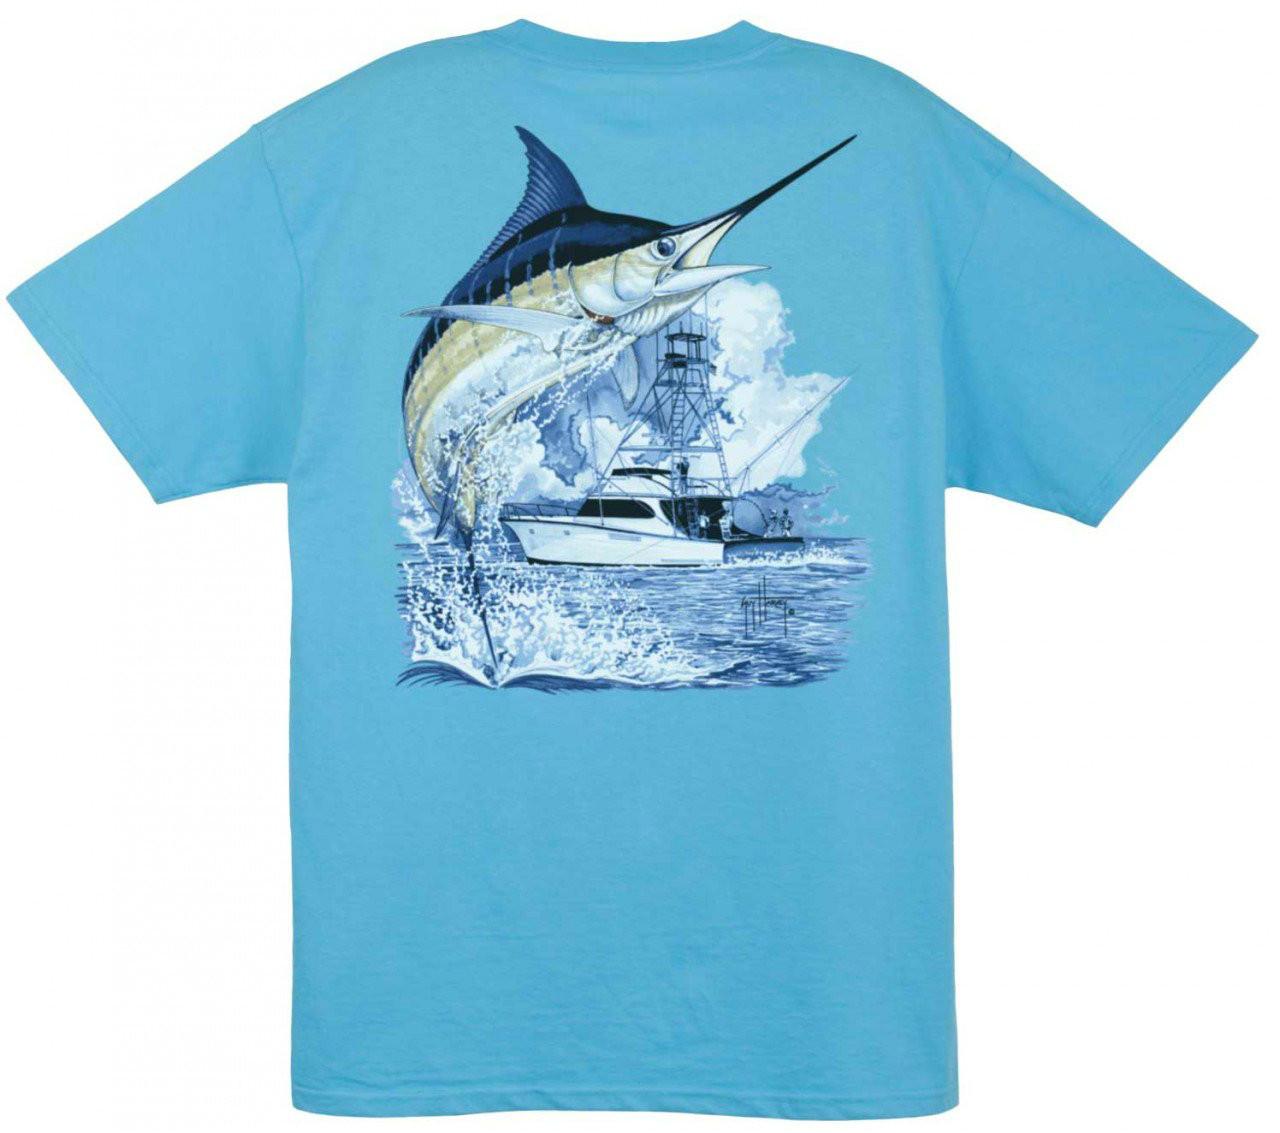 c2160d5195176 Guy Harvey Marlin Boat Back-Print T-Shirt